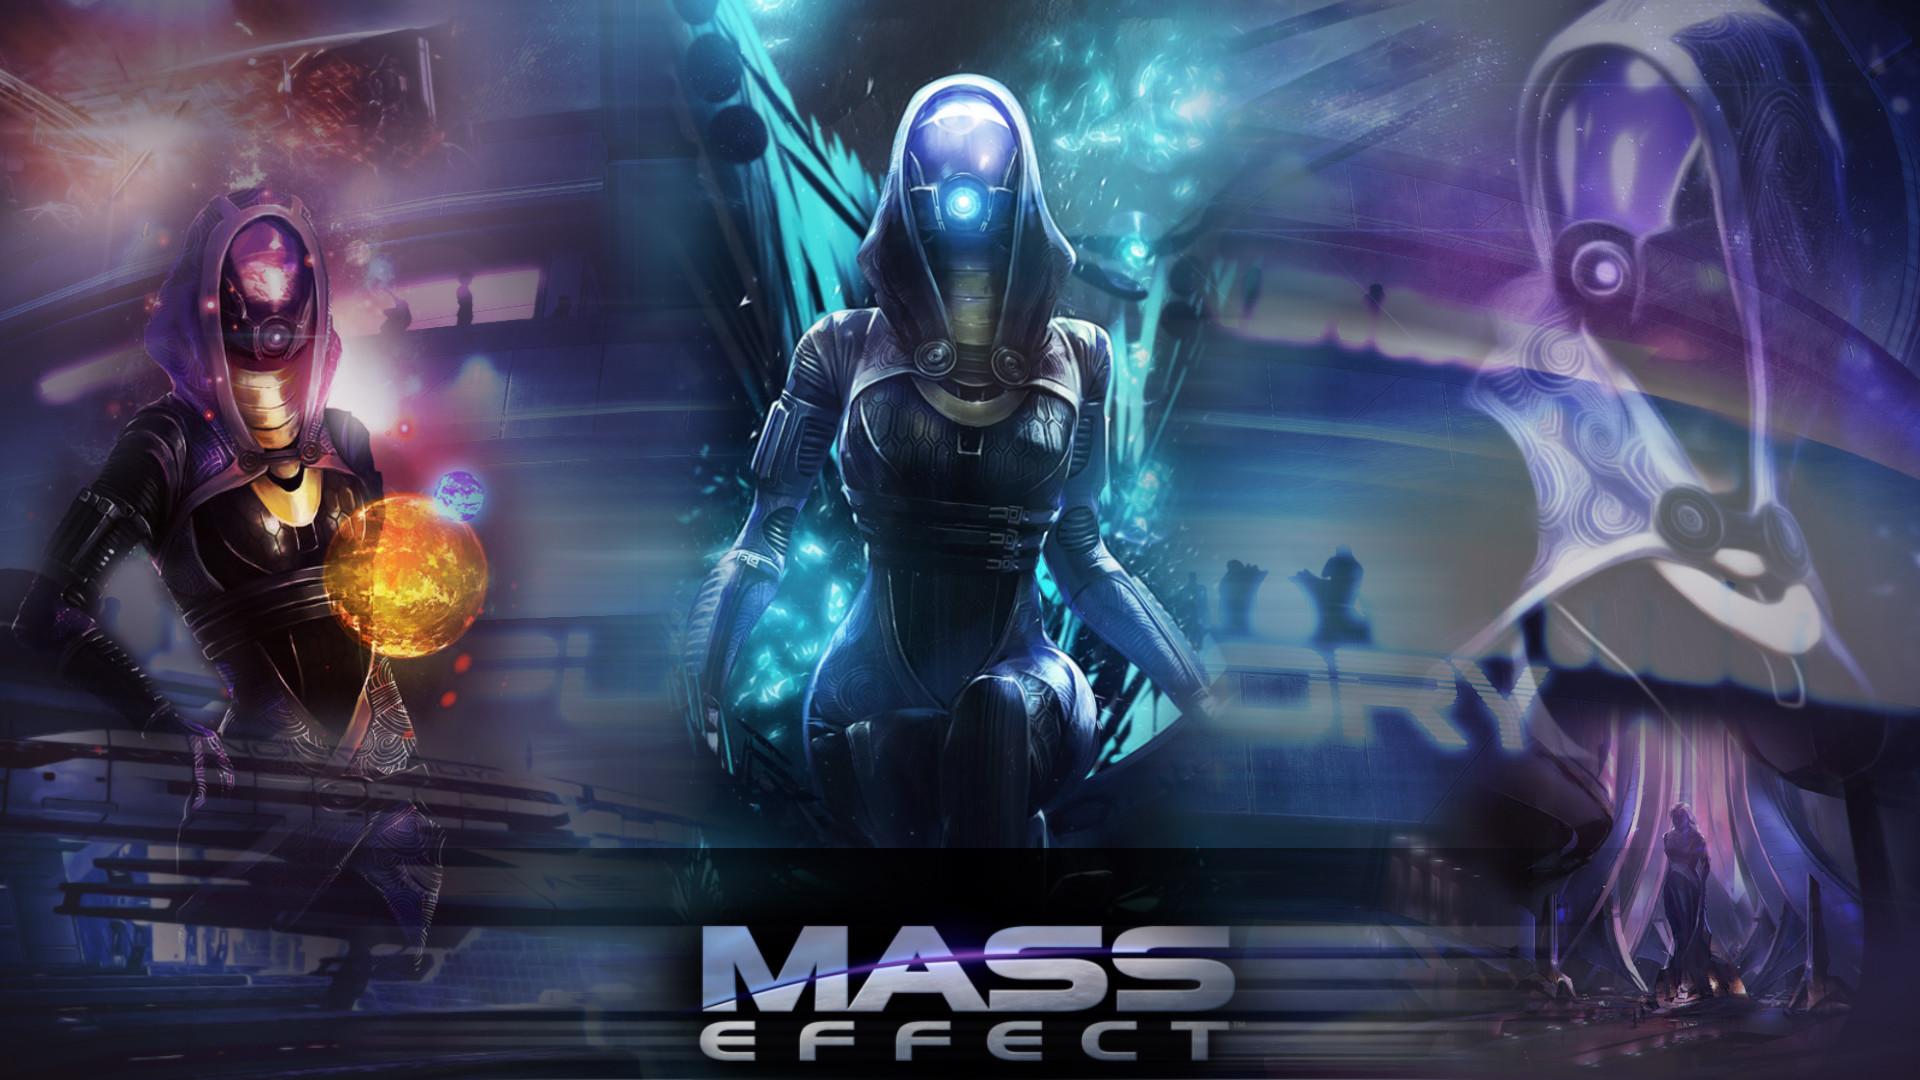 … Mass Effect – Tali'zorah Wallpaper by ShunKazami787